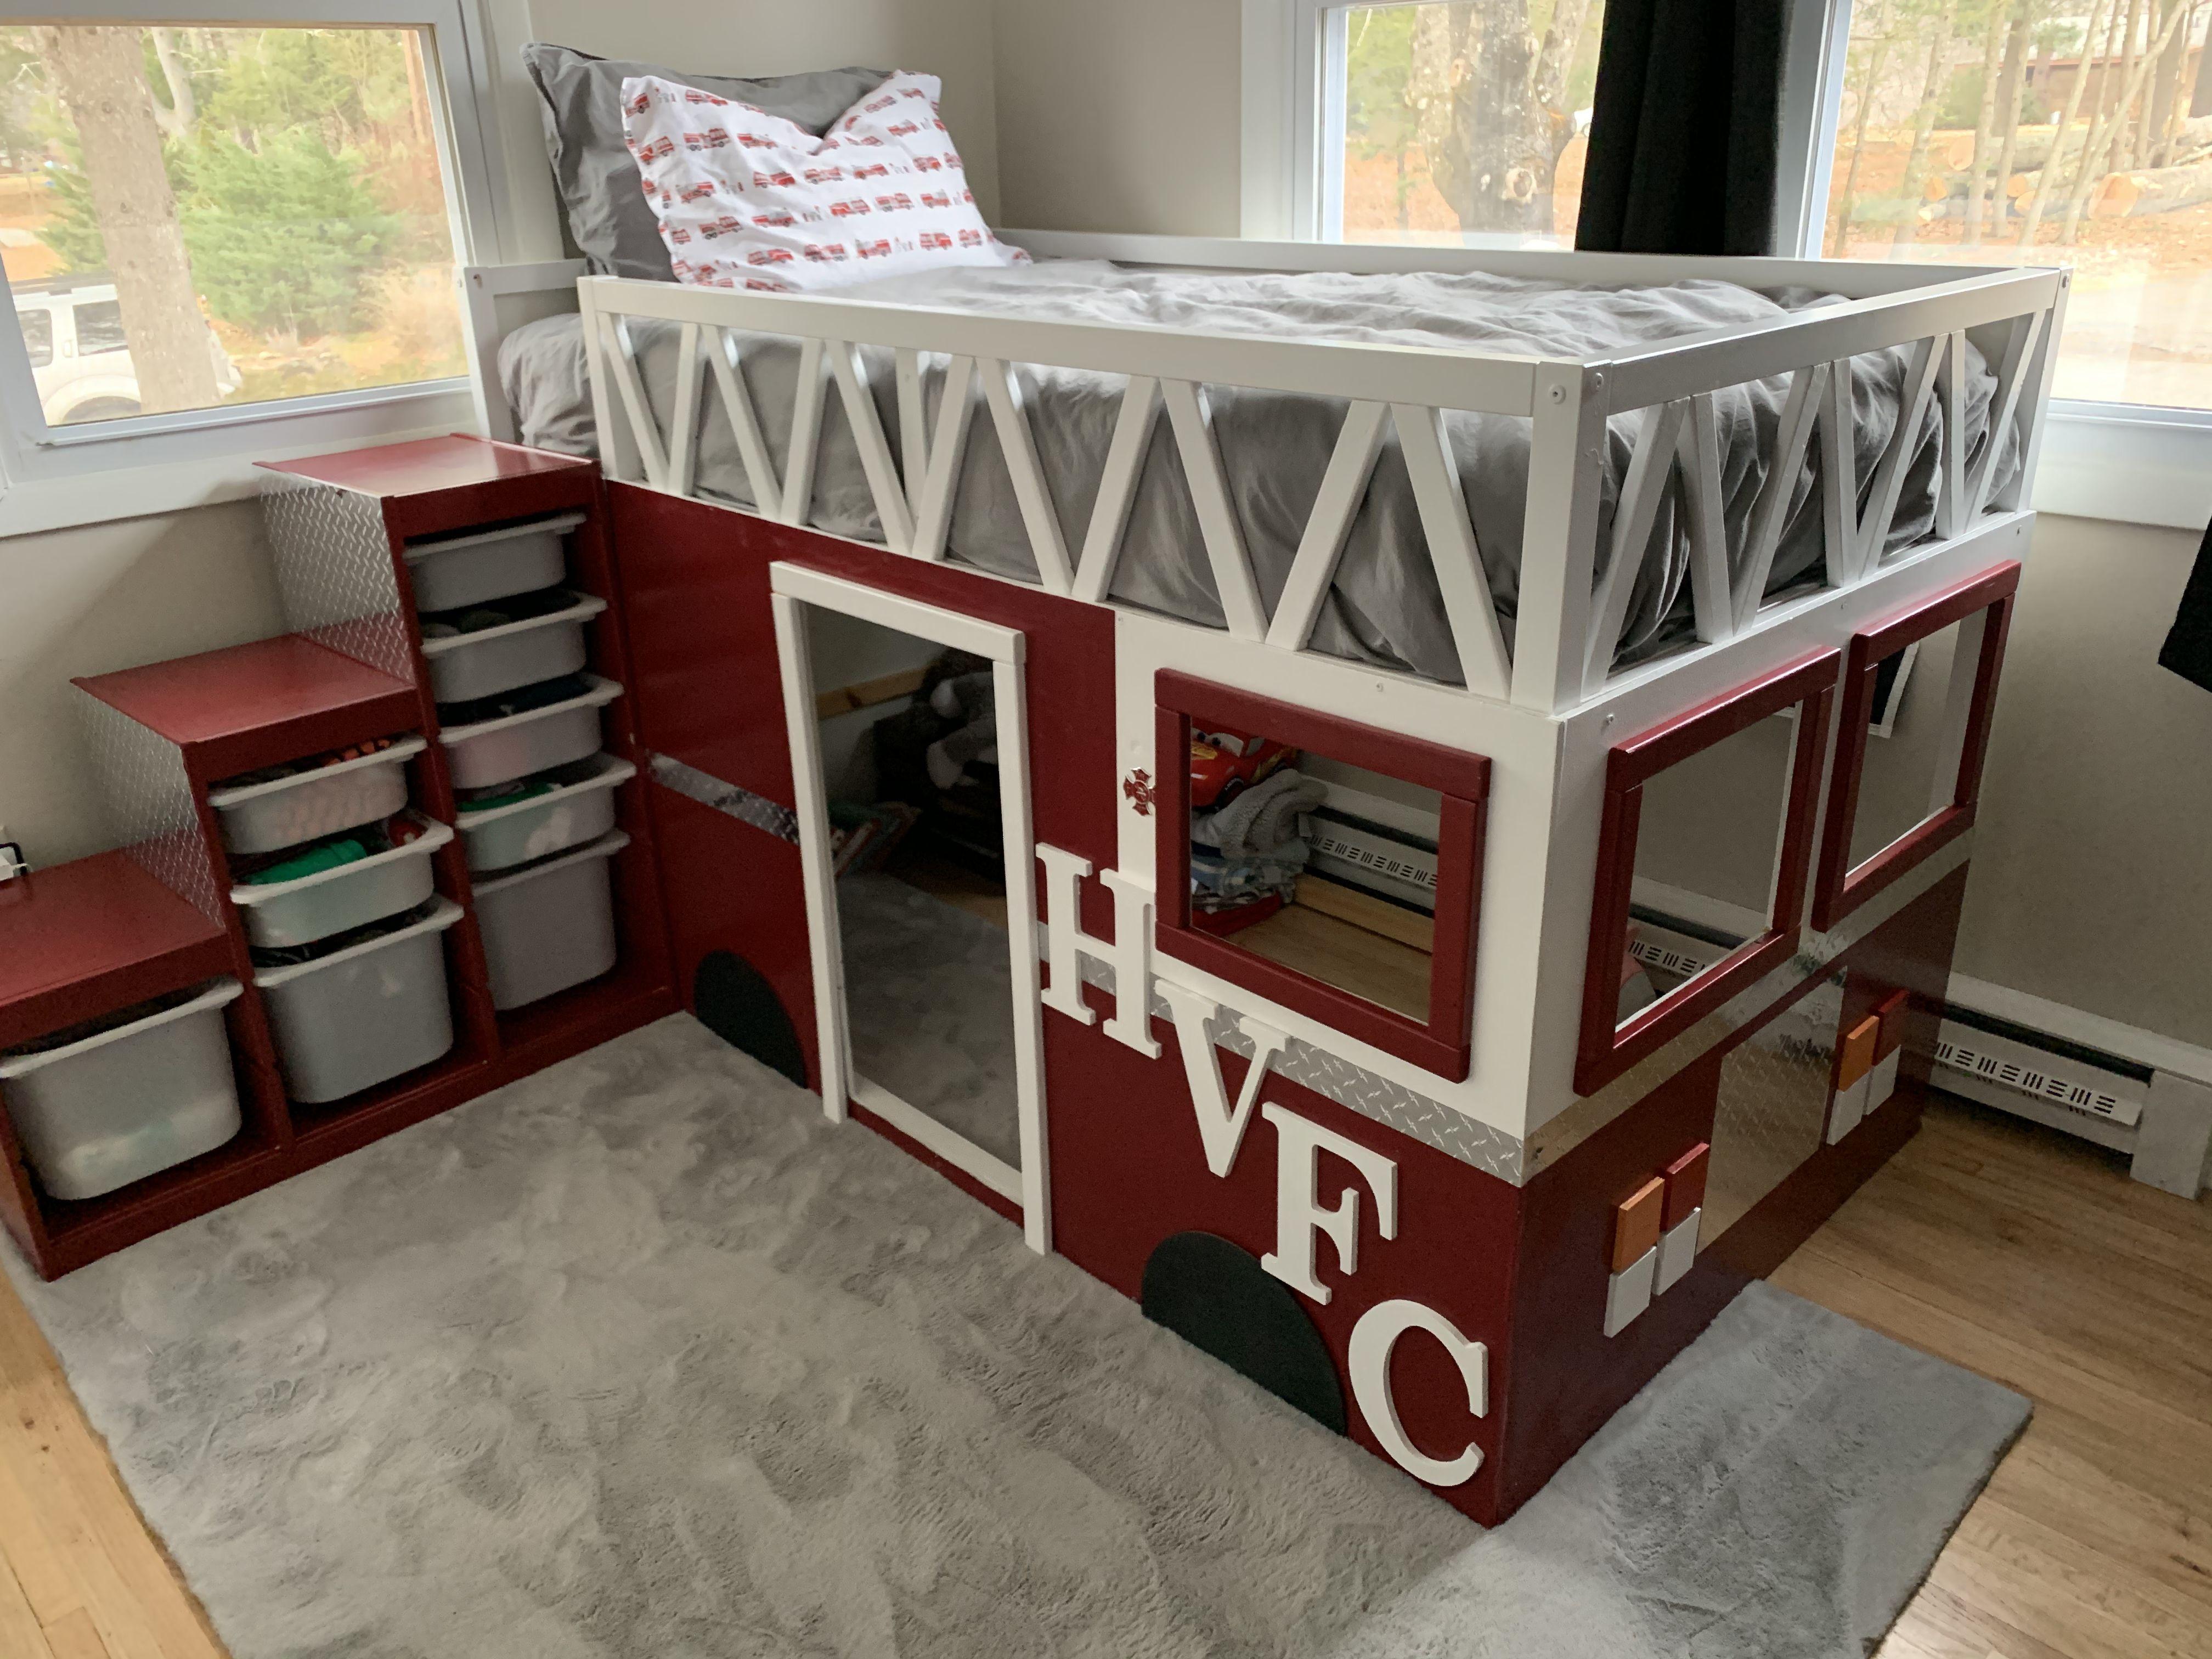 Ikea Kura Fire truck bed hack | Truck bed, Fire trucks